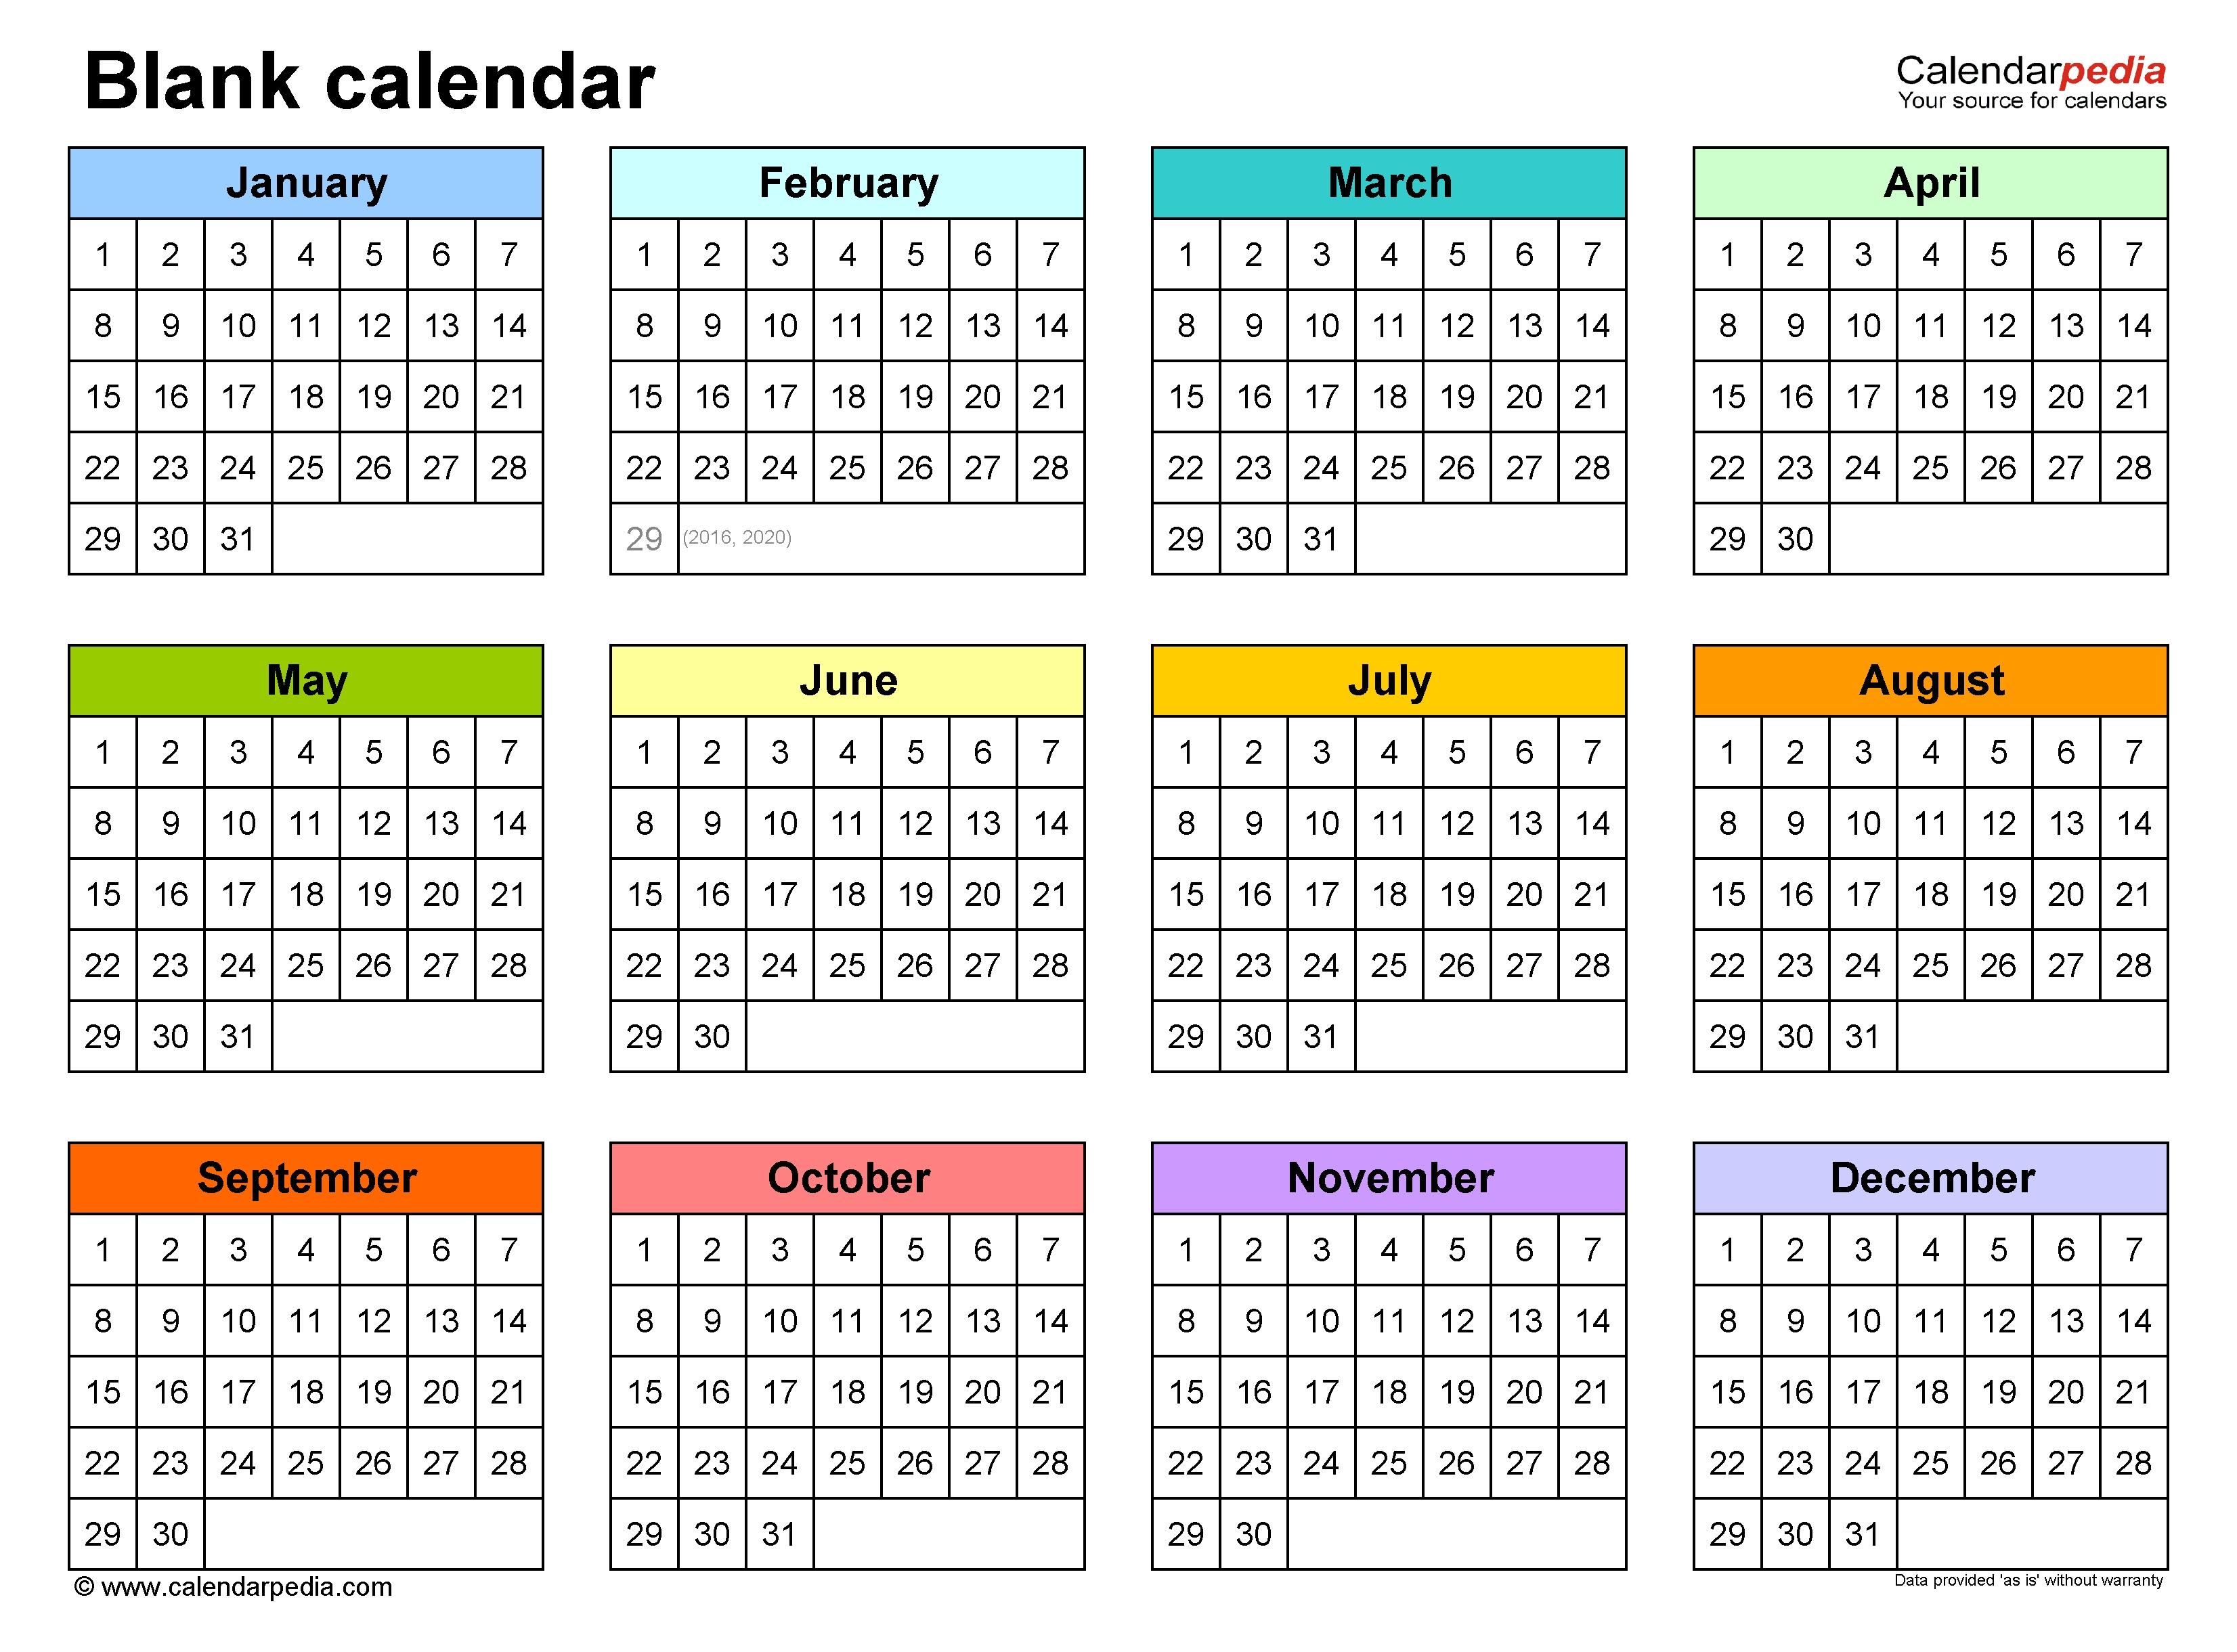 Blank Calendars - Free Printable Microsoft Word Templates Year Long Calendar Template